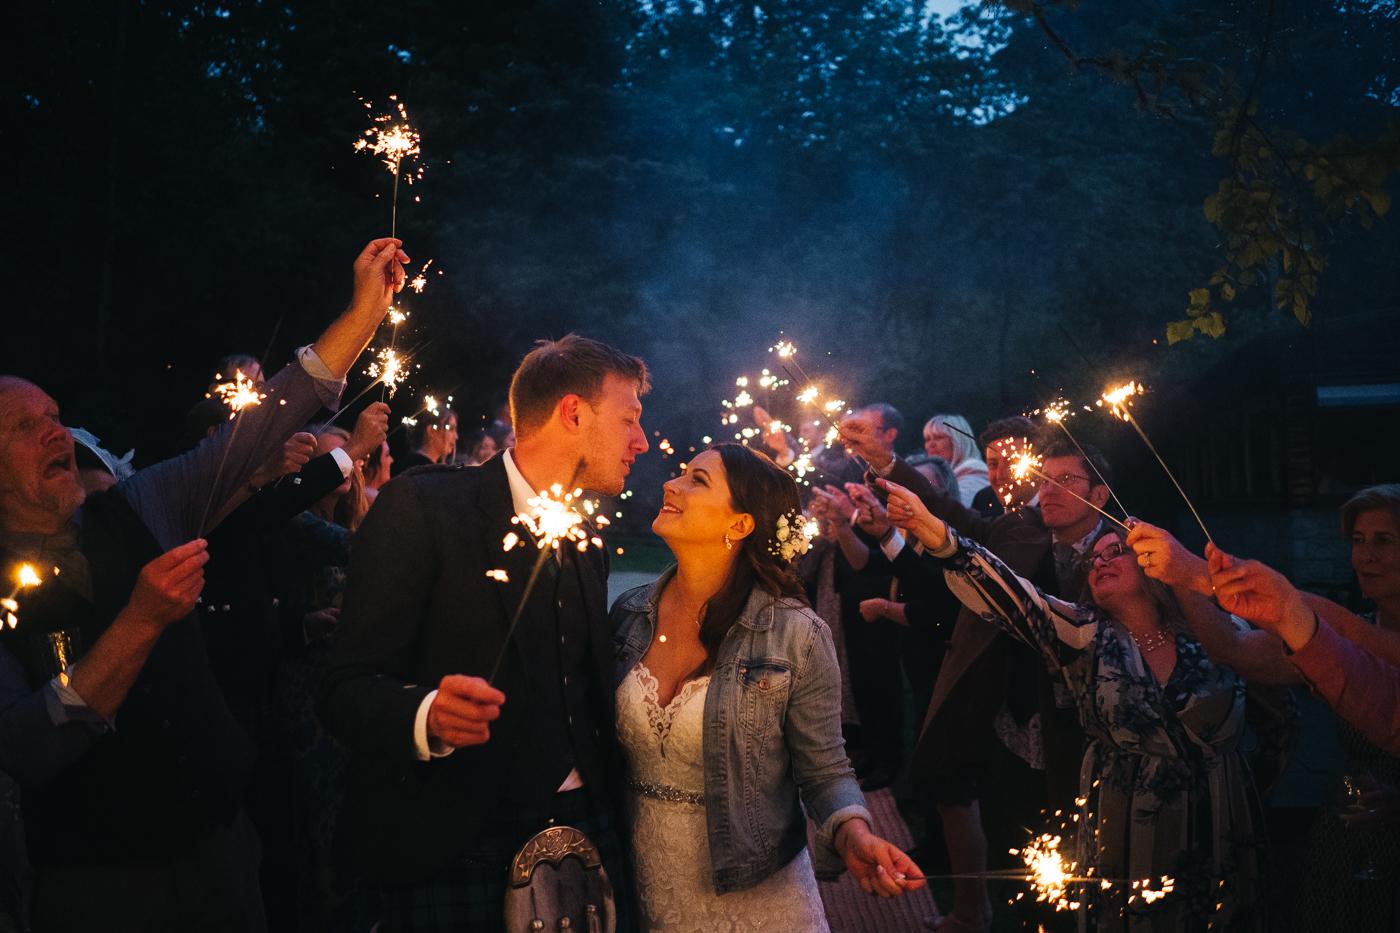 scottish-wedding-trossachs-loch-tay-highlannds-relaxed-photography-photographer-0054.jpg